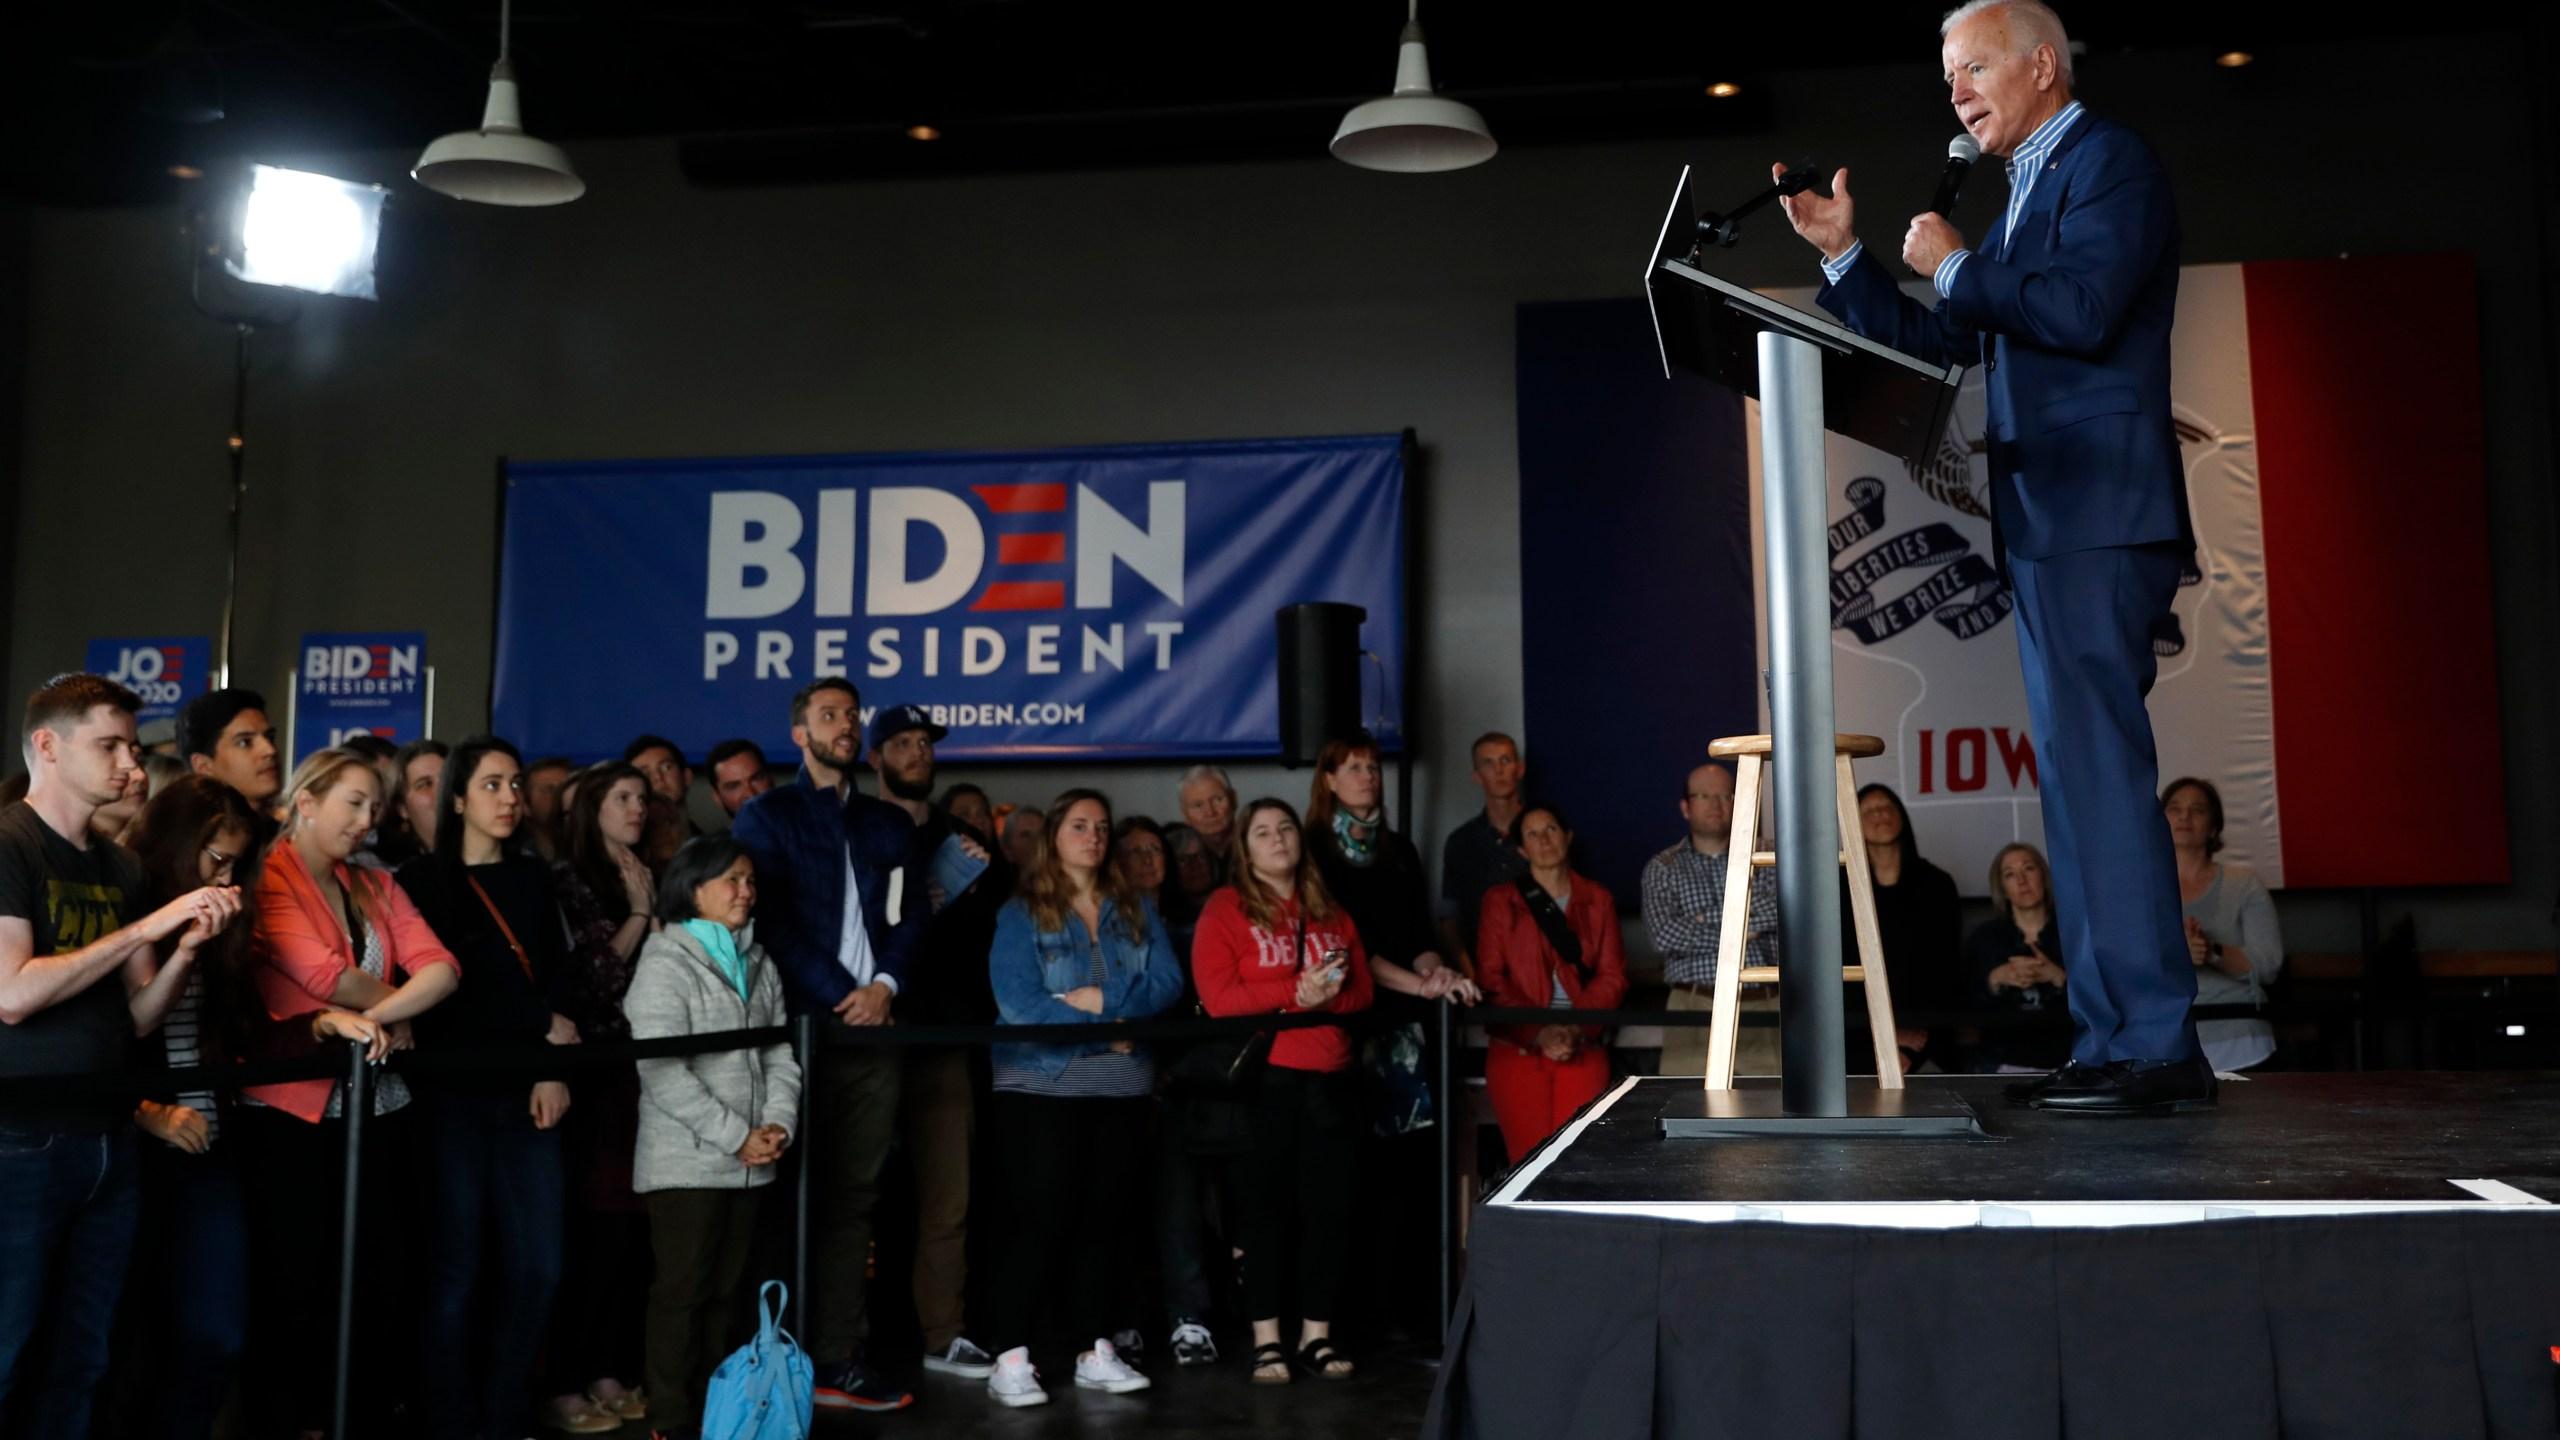 Election_2020_Joe_Biden_87826-159532.jpg07858206